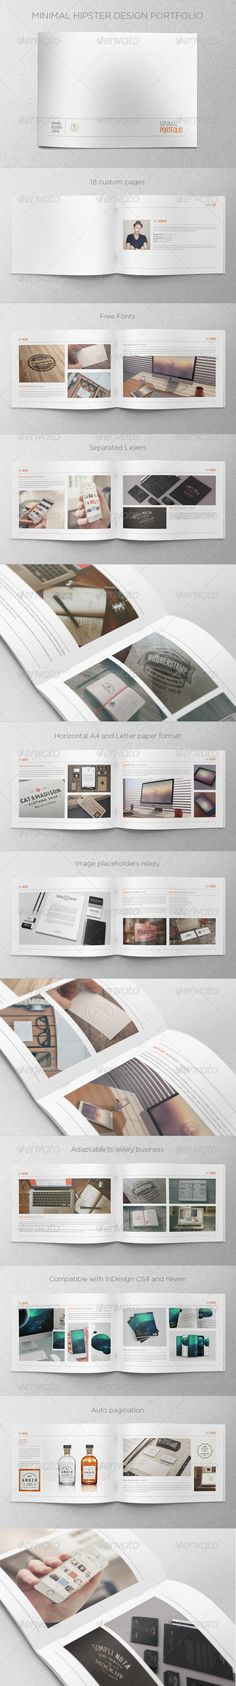 Minimal Hipster Design Portfolio - Print Templates